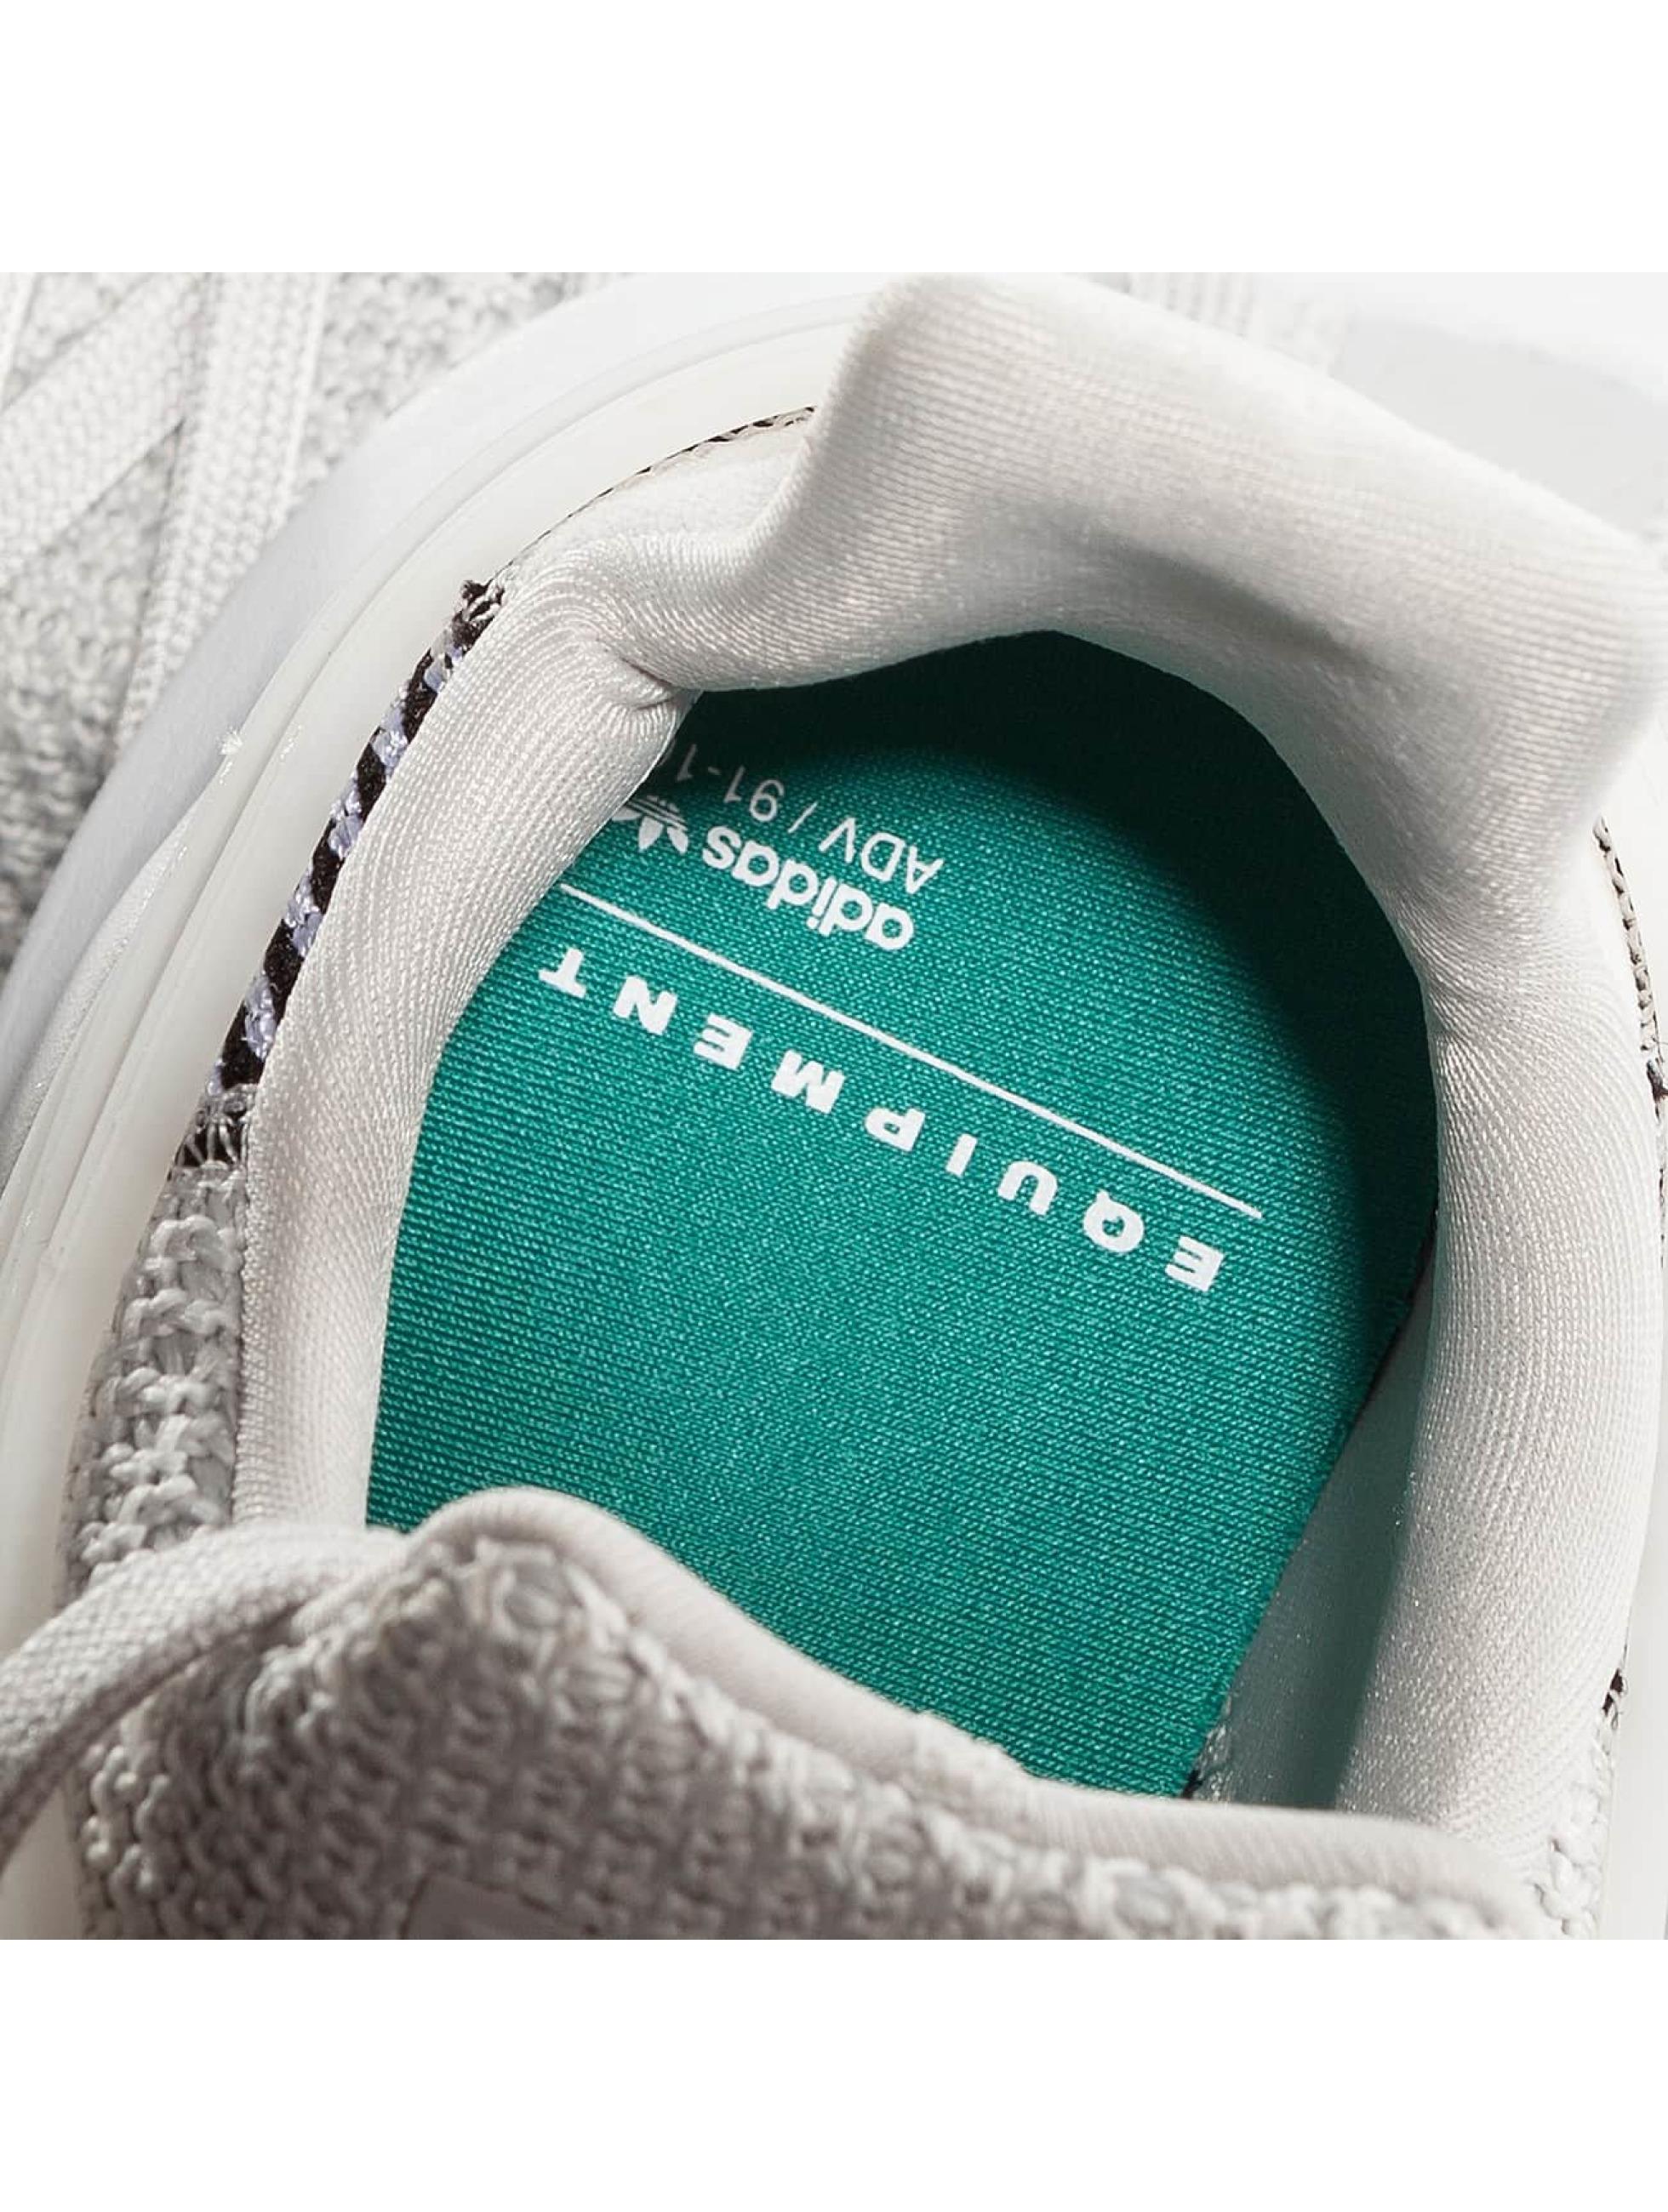 adidas originals Baskets Equipment Support ADV blanc